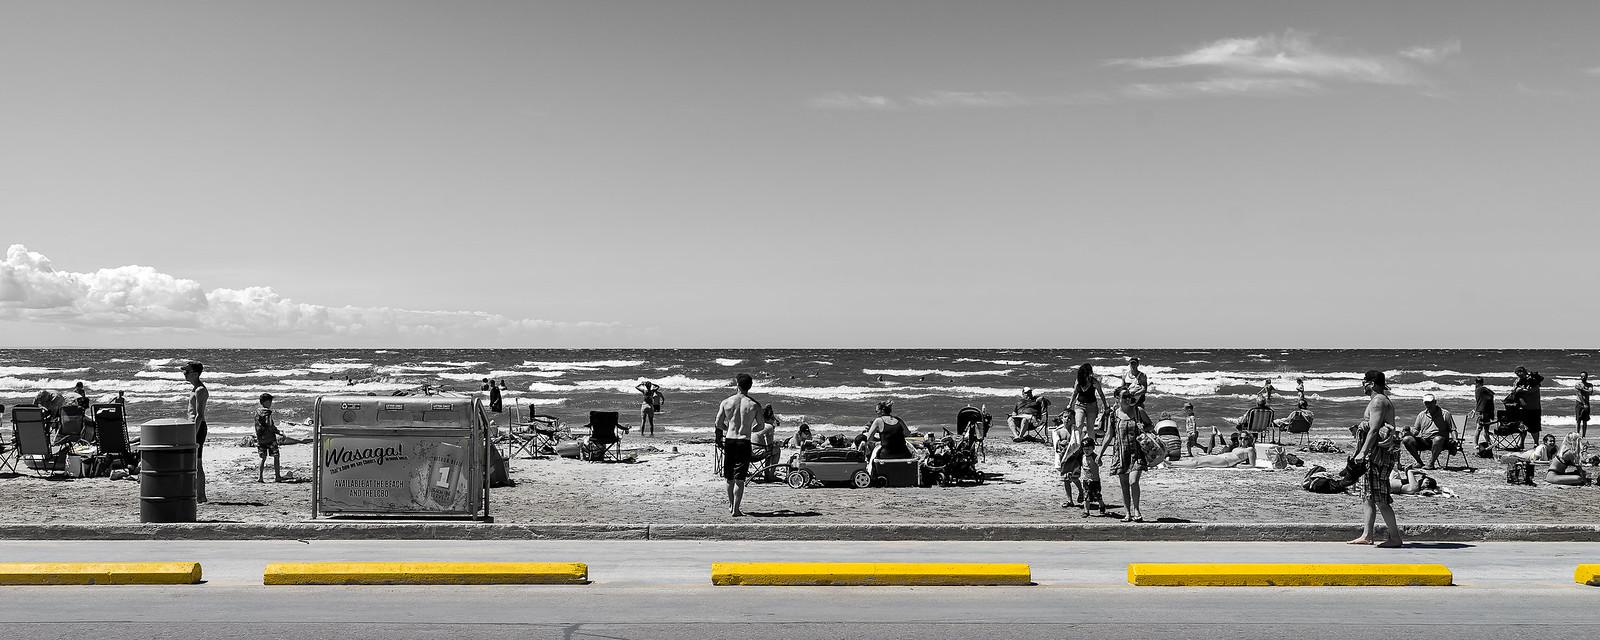 La plage... 43478403621_b20eeecfa5_h